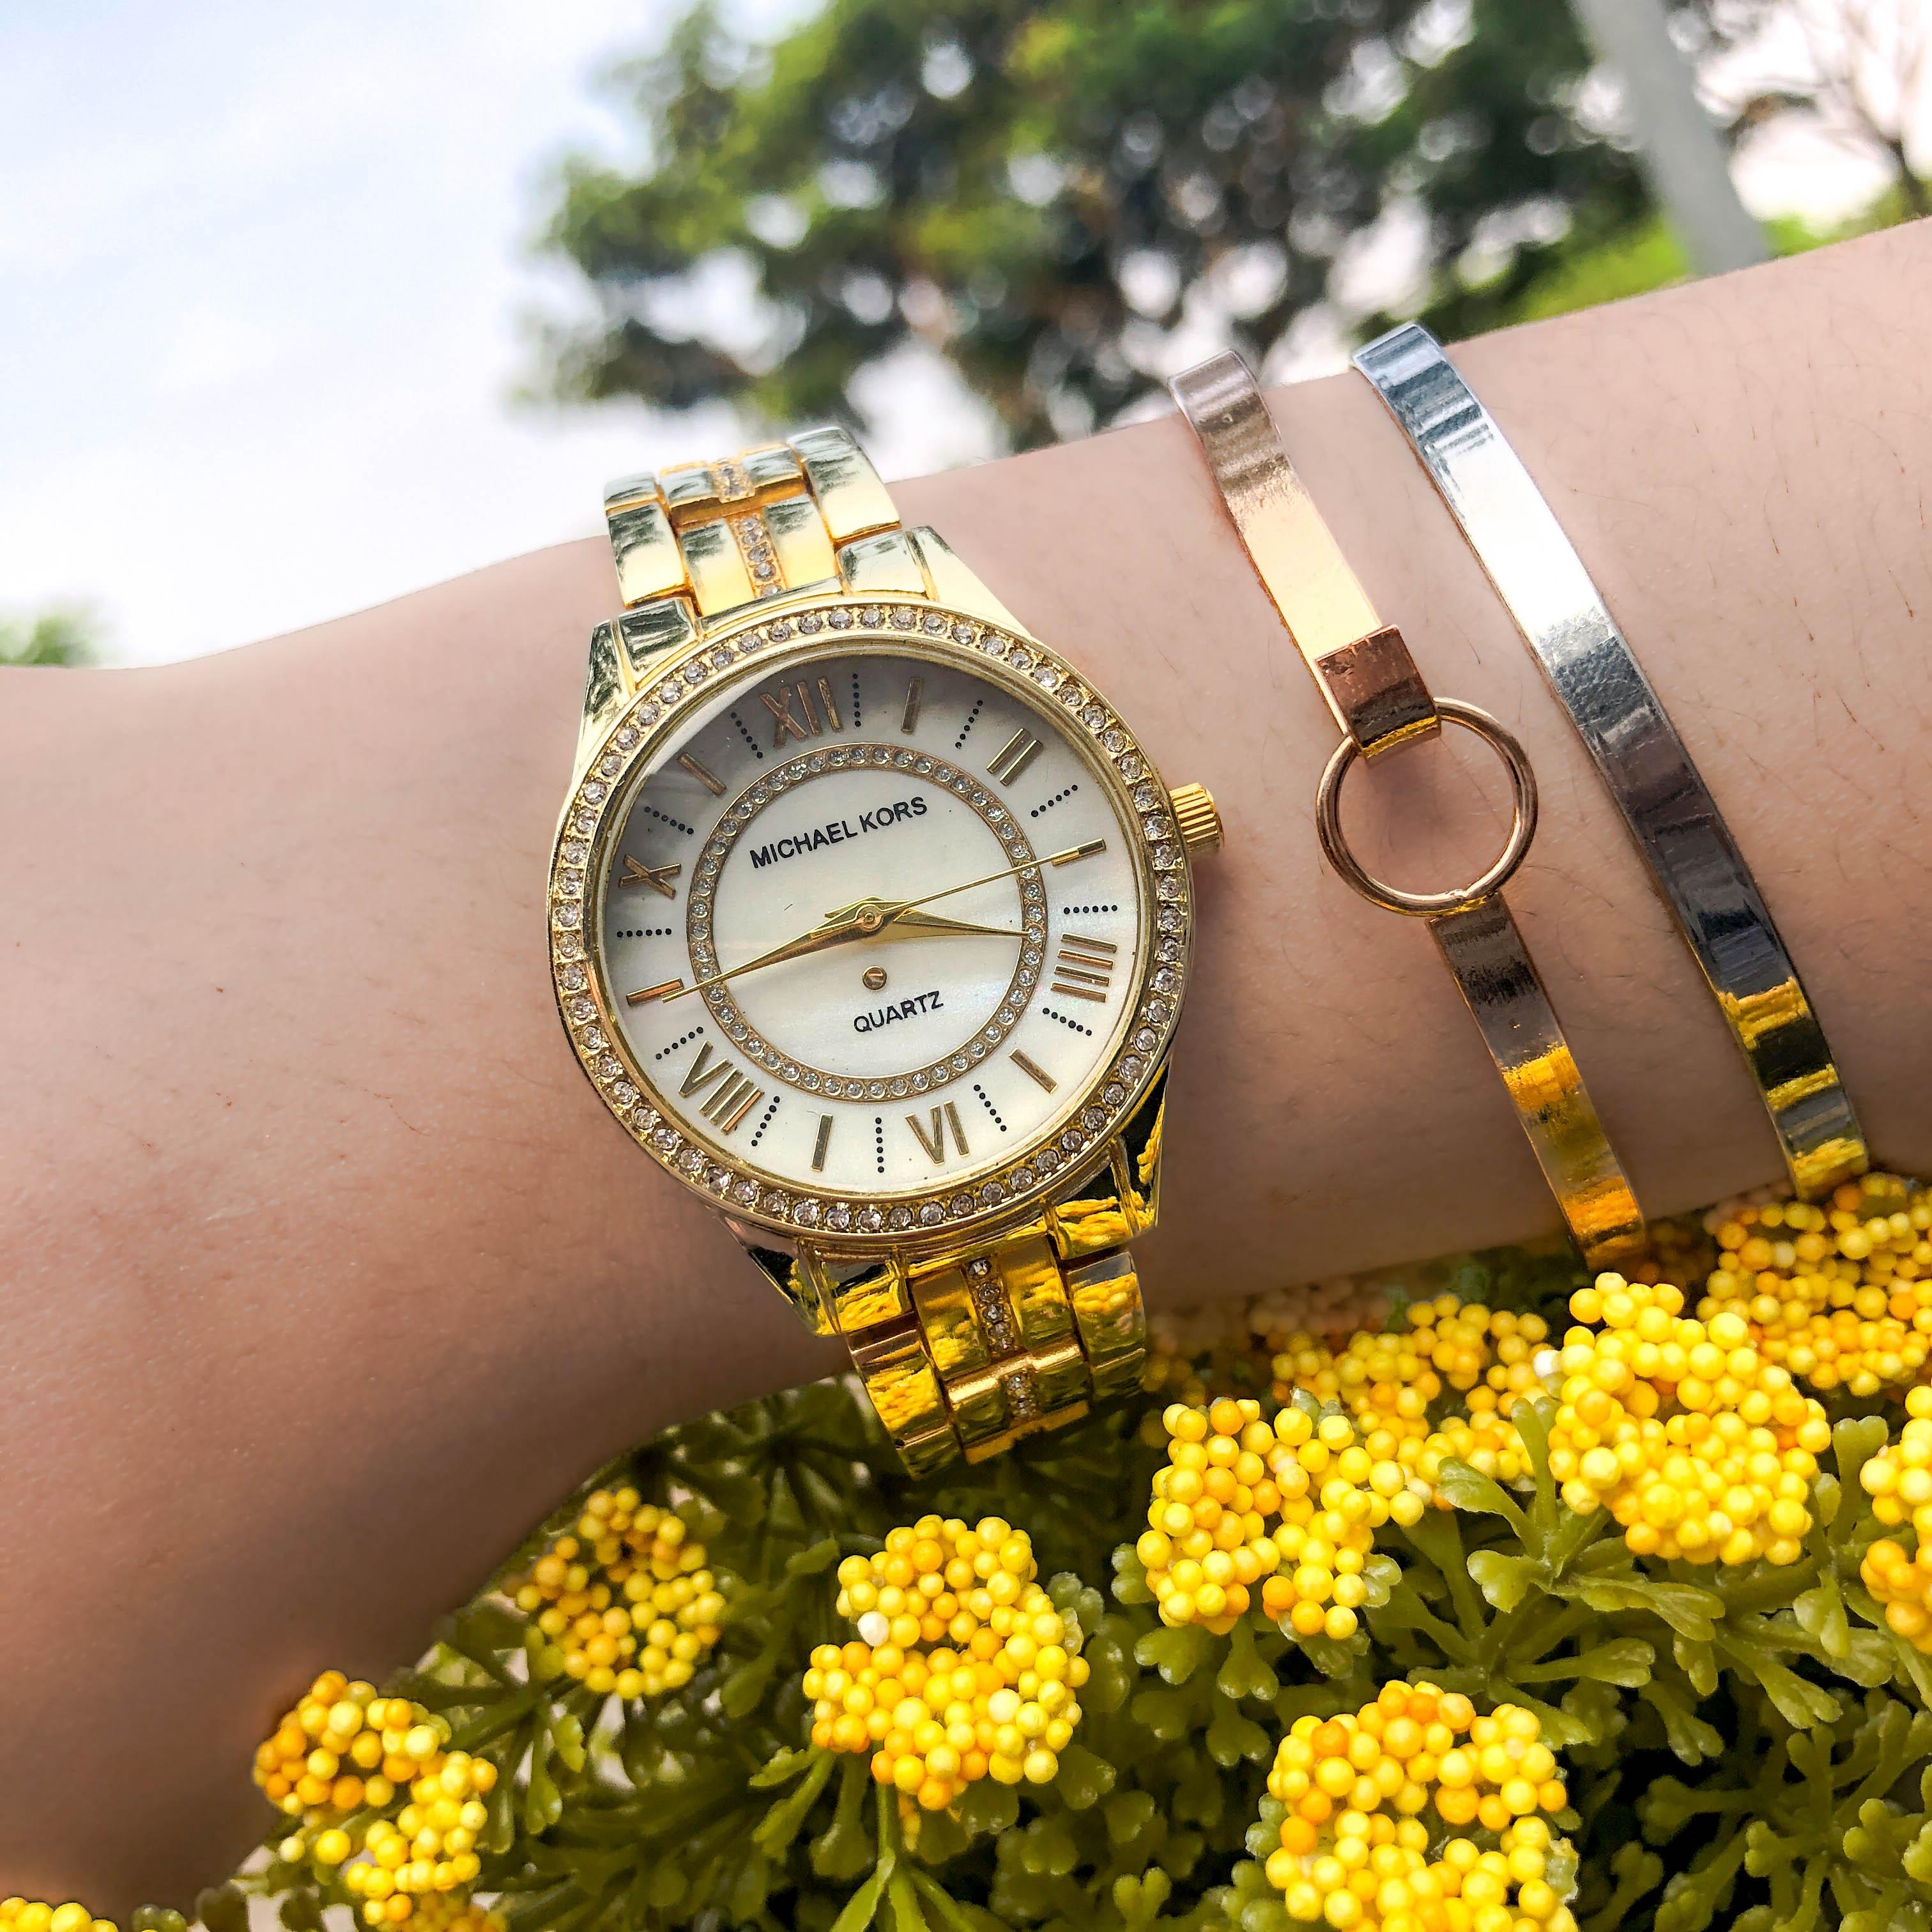 Jam Tangan MICHAEL KORS Fashion Watch Chain Gold Frame Gold Dial Gold Band MKO001